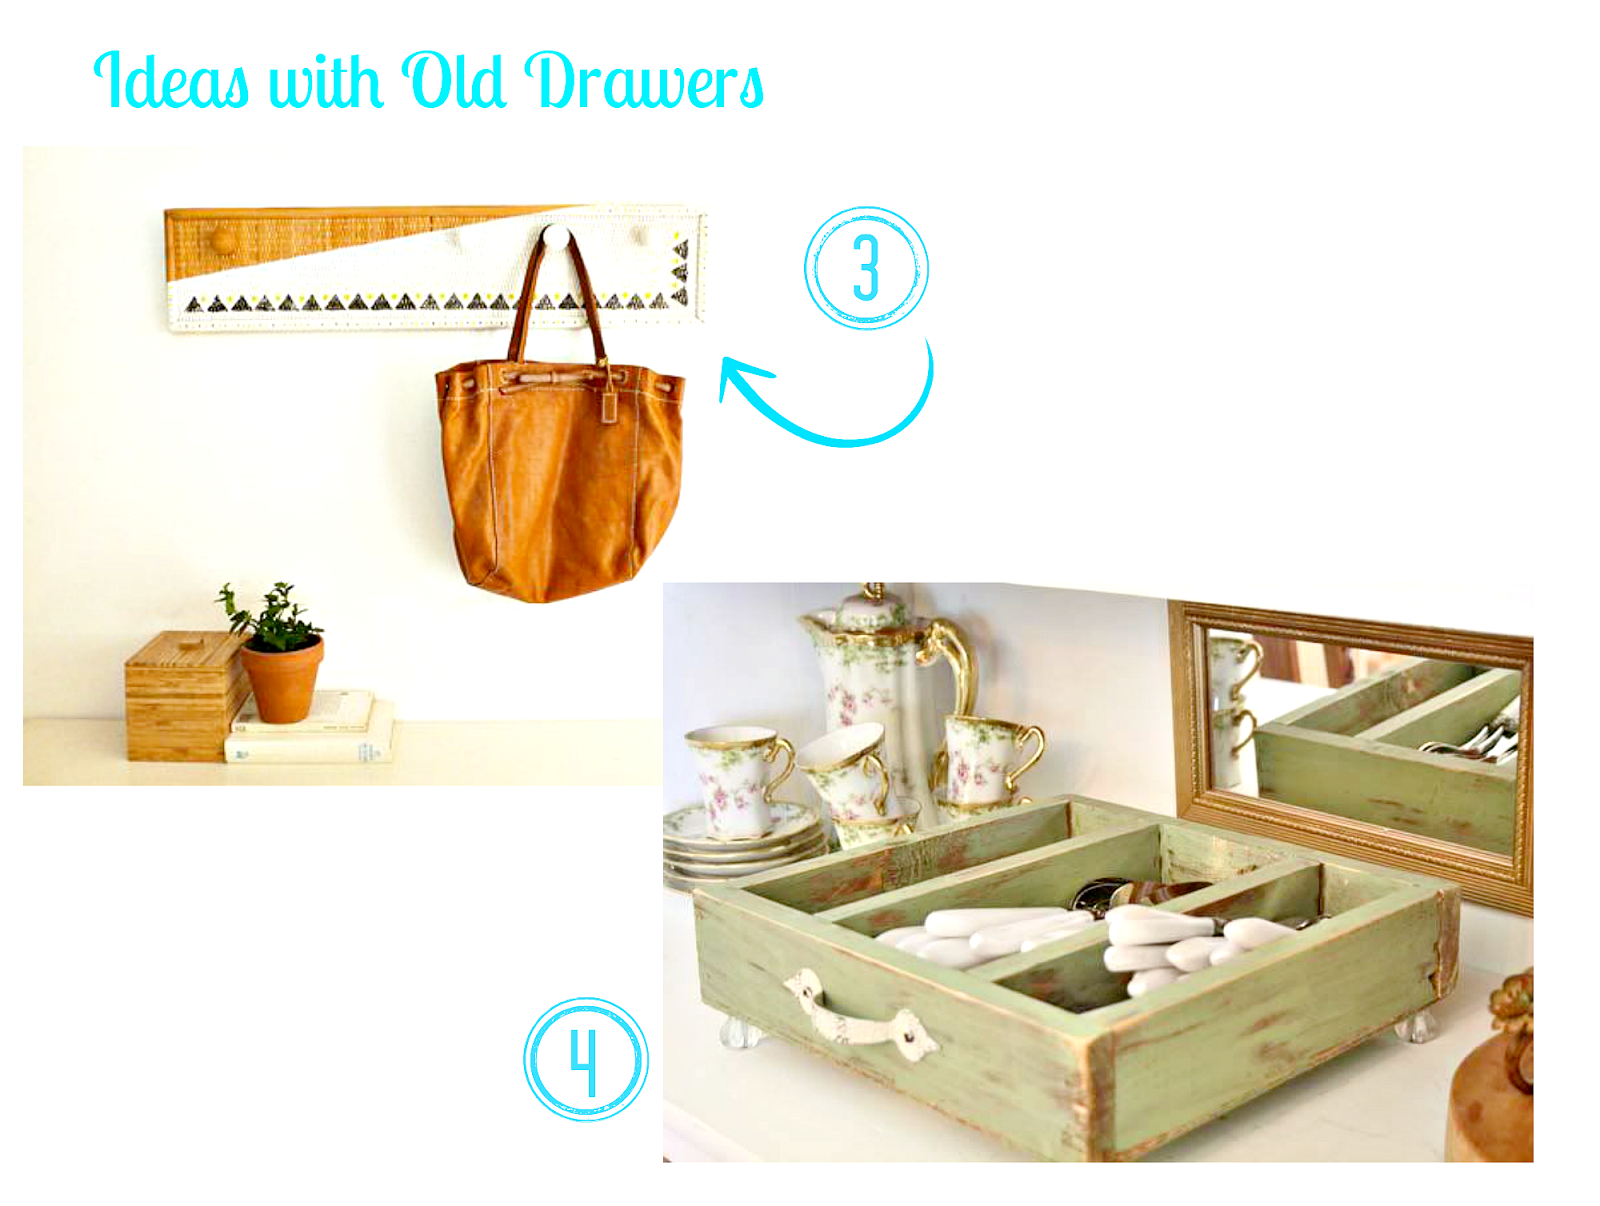 drawers idea